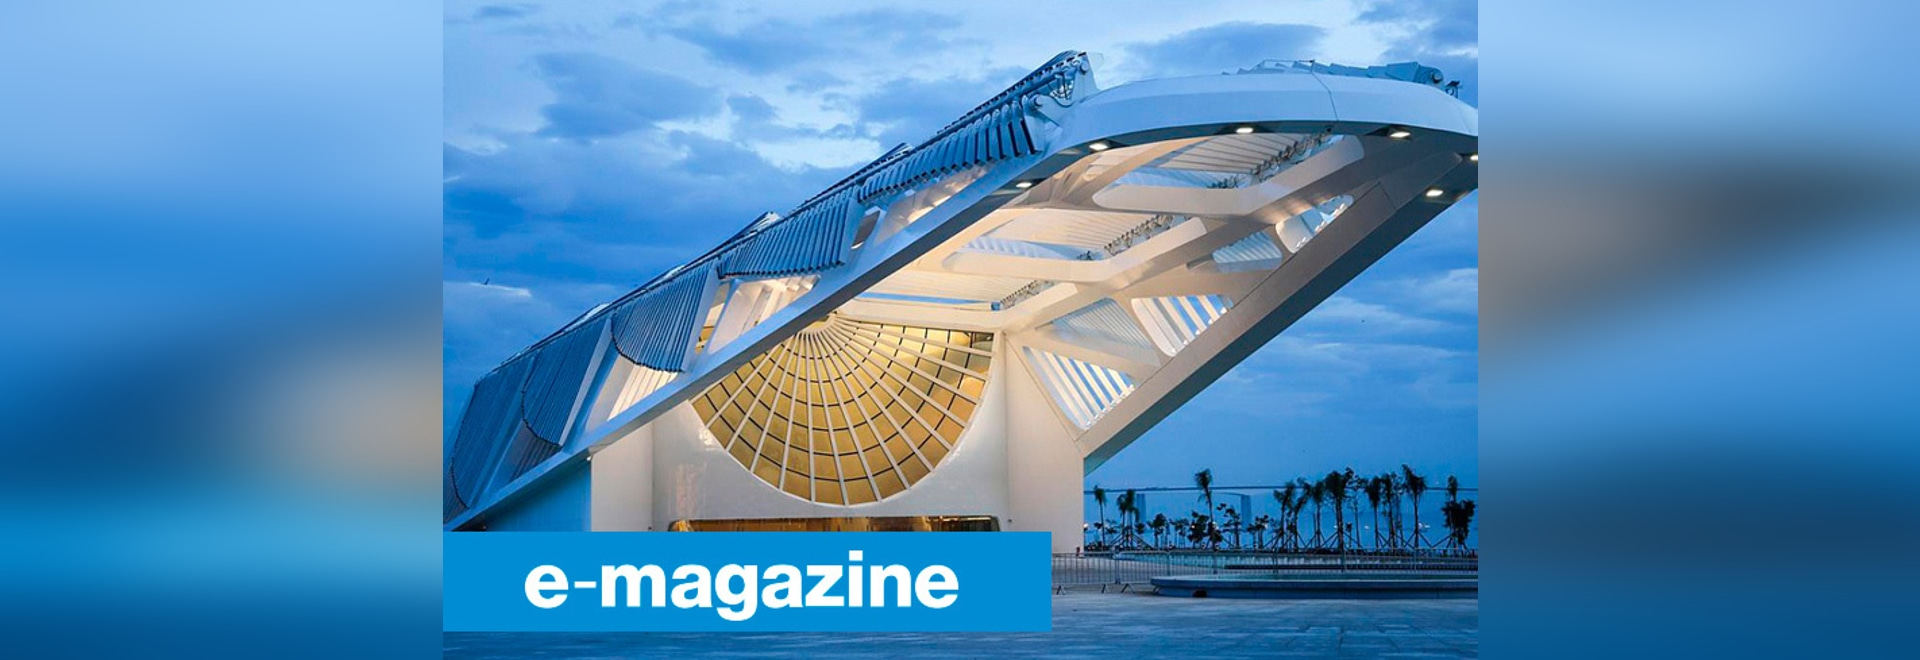 Courtoisie de Santiago Calatrava